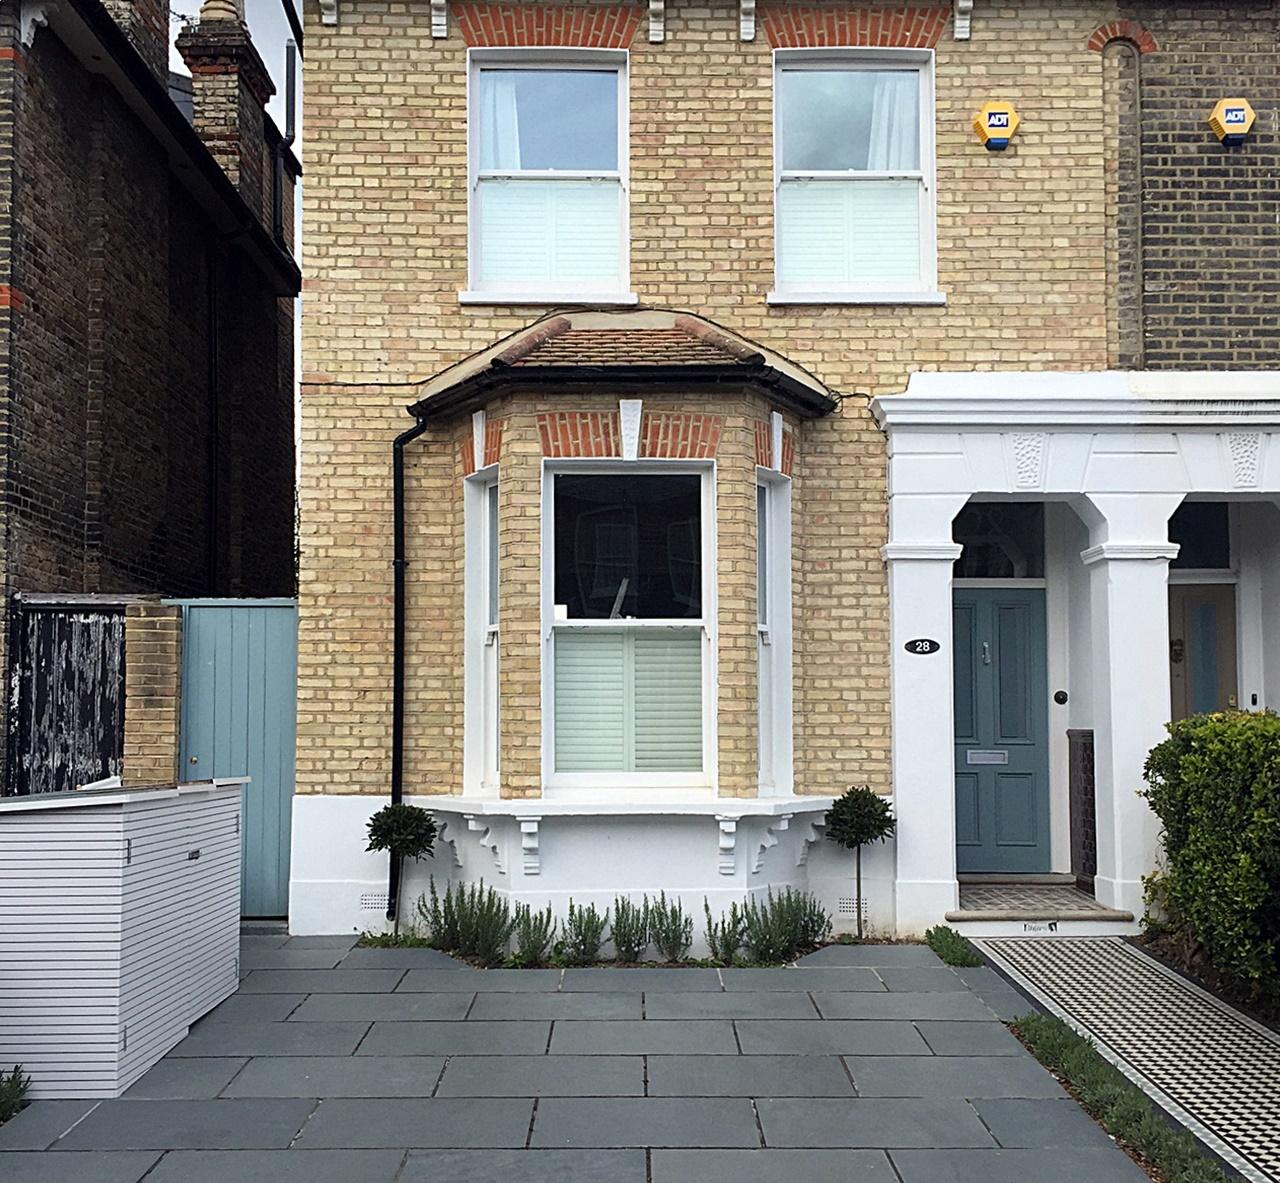 Bespoke Bin Store Driveway Grey Colour Path Tile Planting Front - Front garden driveway ideas uk